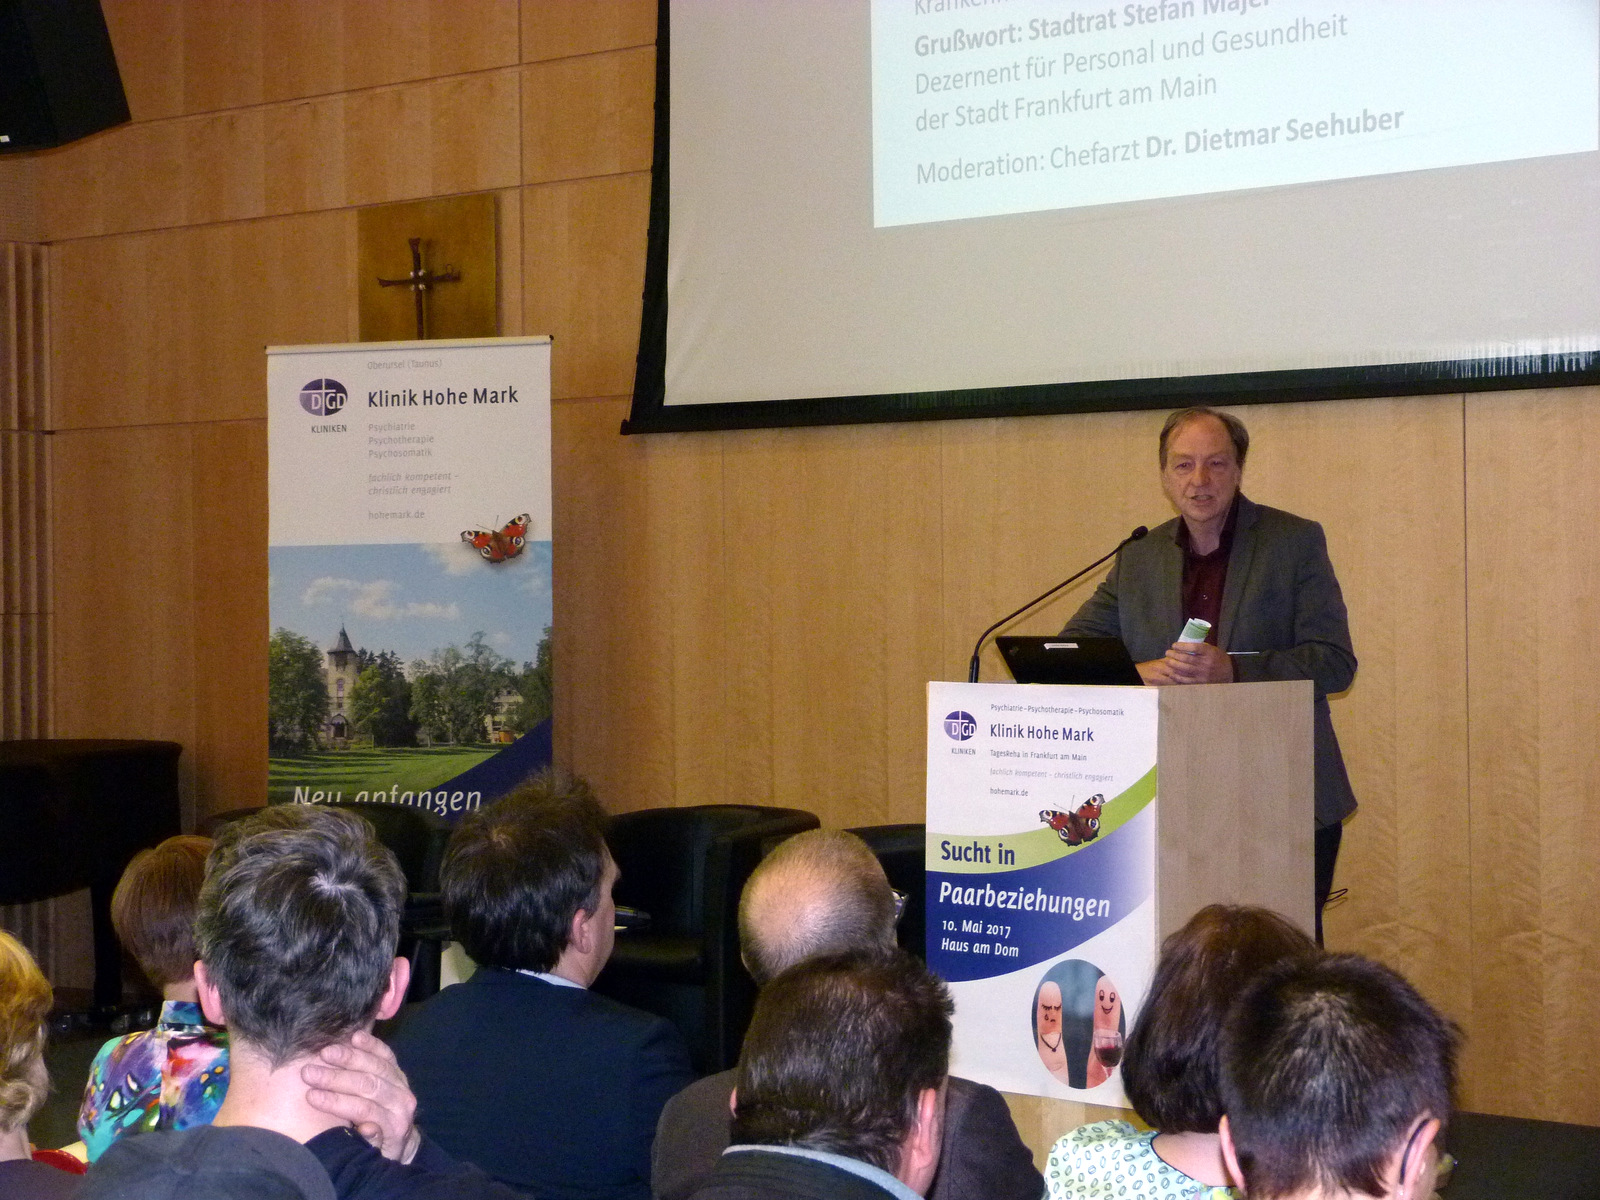 Chefarzt Dr. Dietmar Seehuber begrüßt die Gäste